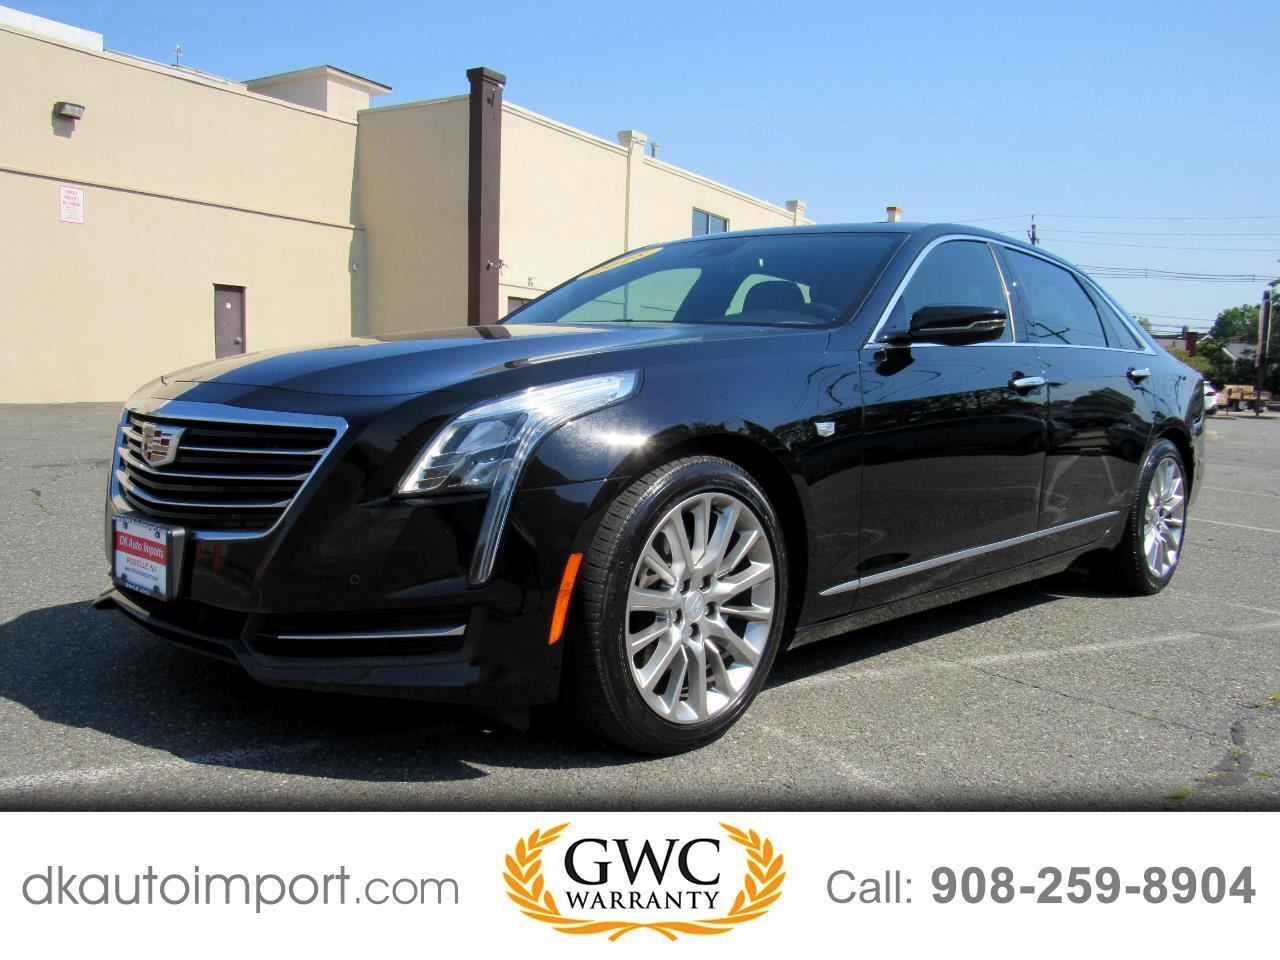 Cadillac CT6 3.0L Premium Luxury Twin Turbo AWD 2018